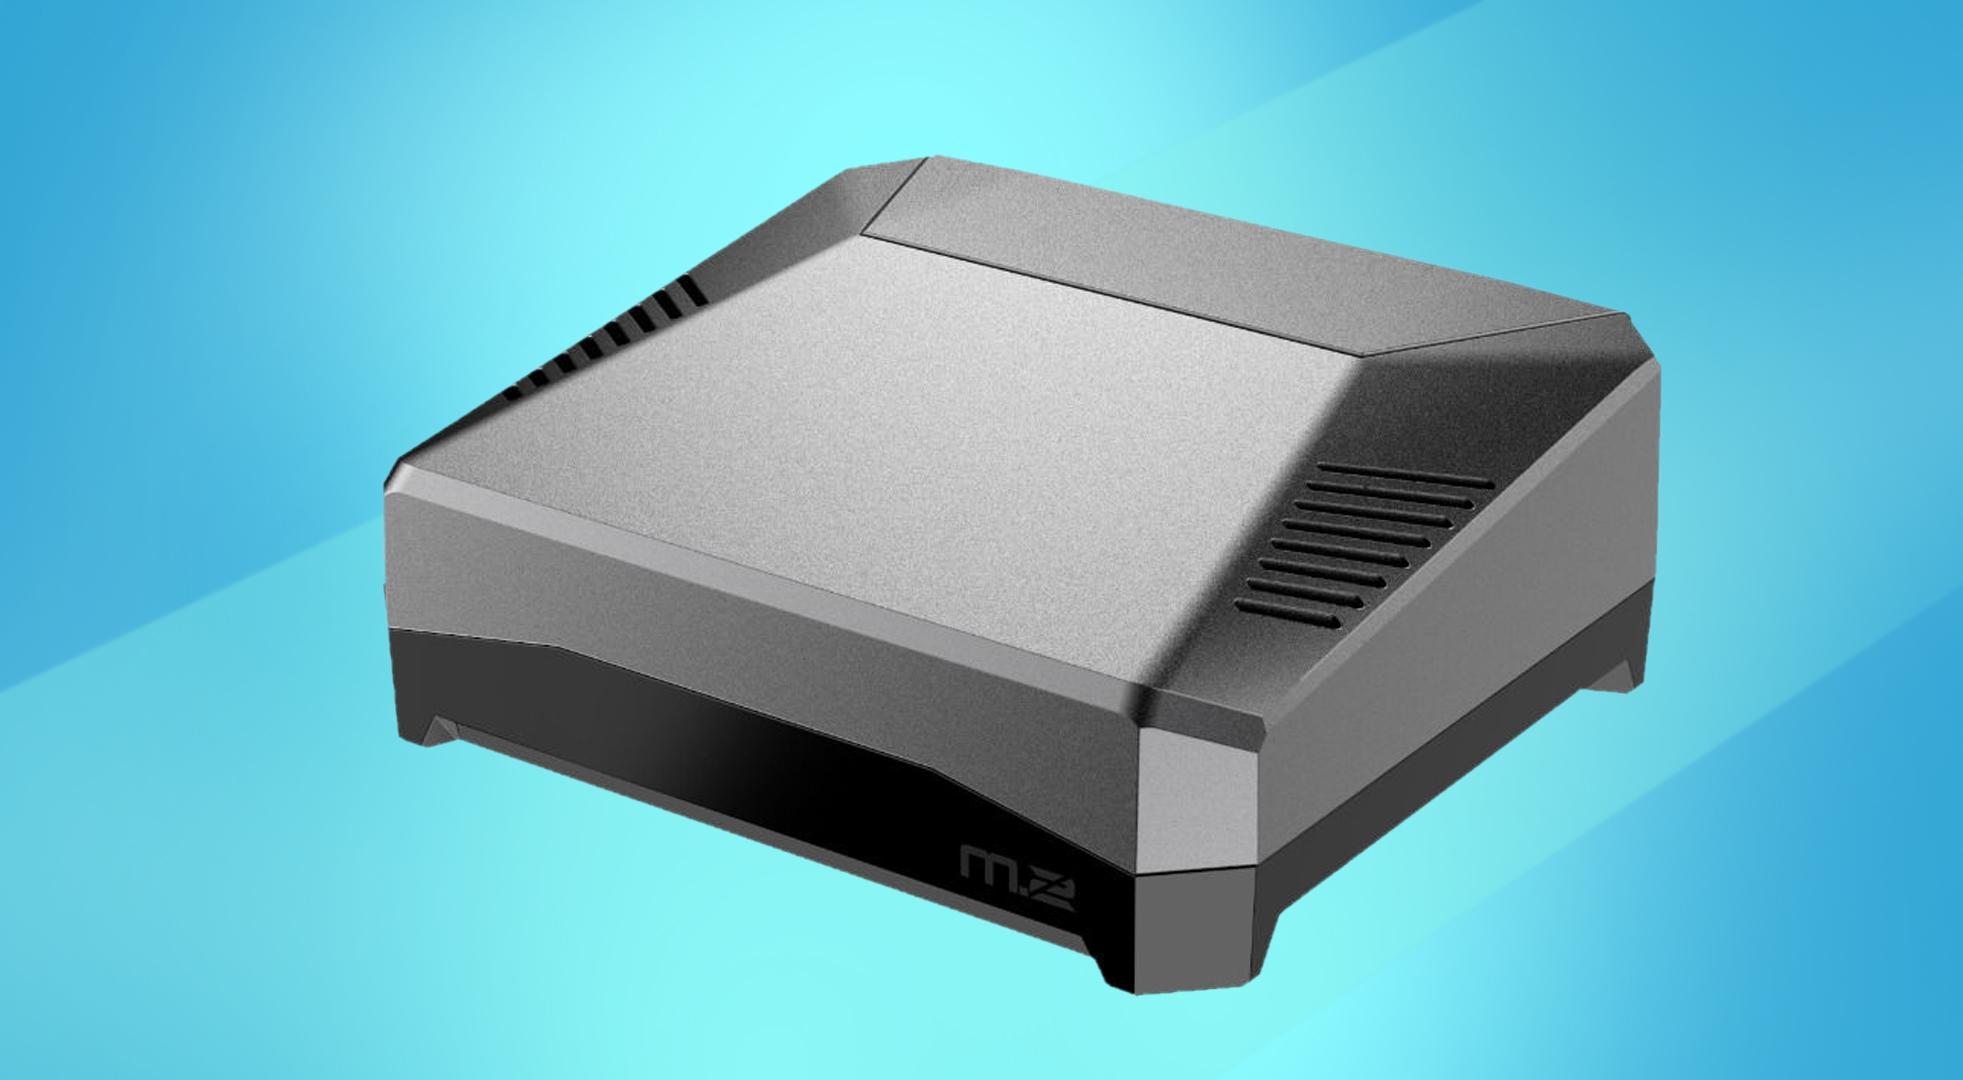 Amd Big Navi And Rdna 2 Gpus Release Date Specs More Tom S Hardware